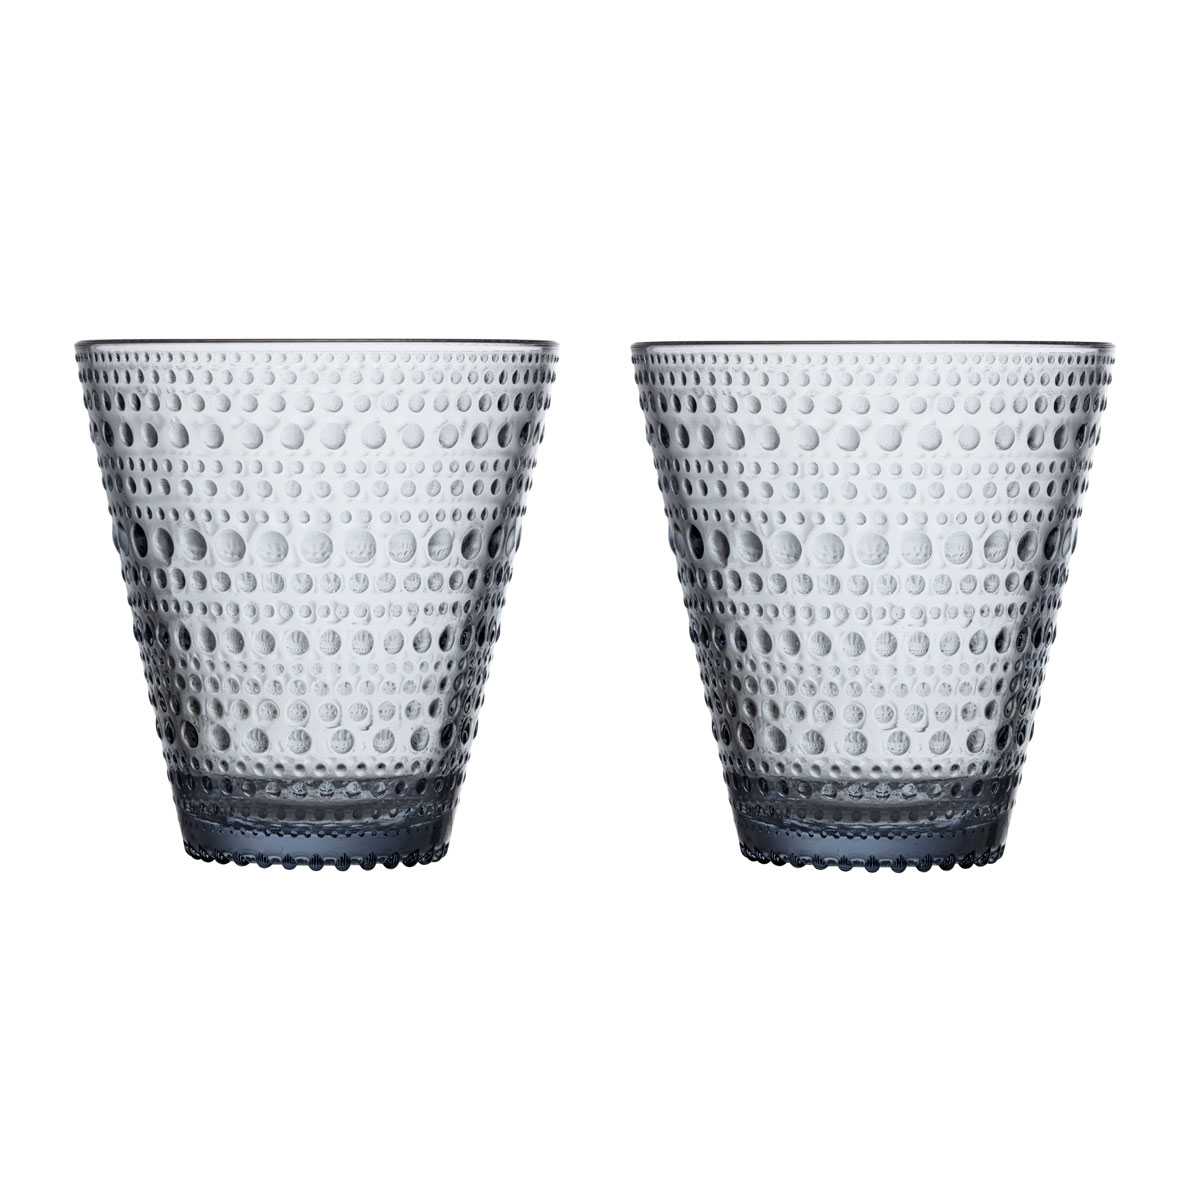 Iittala Kastehelmi Tumbler 10 Oz Pair Recycled Edition